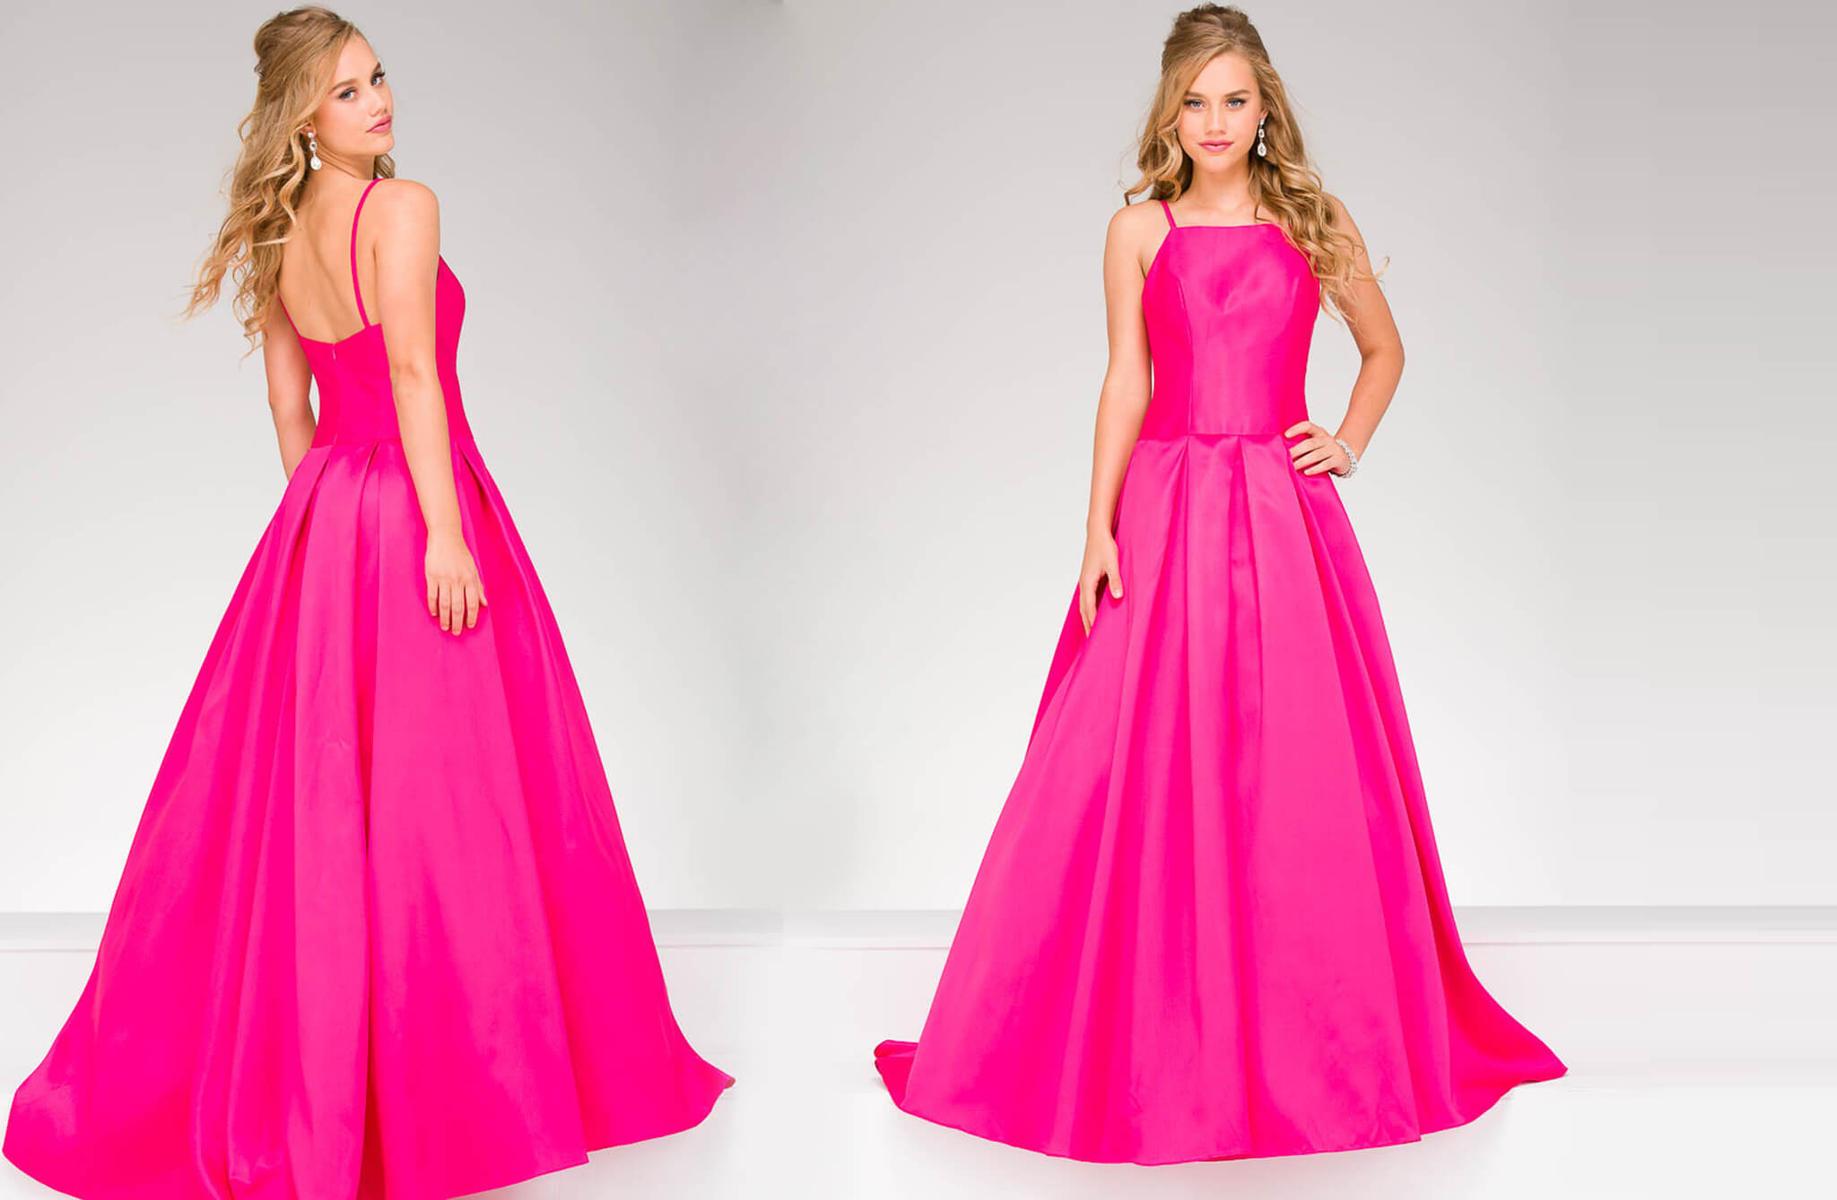 48336 Jovani Prom 2017 Prom Dresses, Pageant Dresses, Cocktail ...